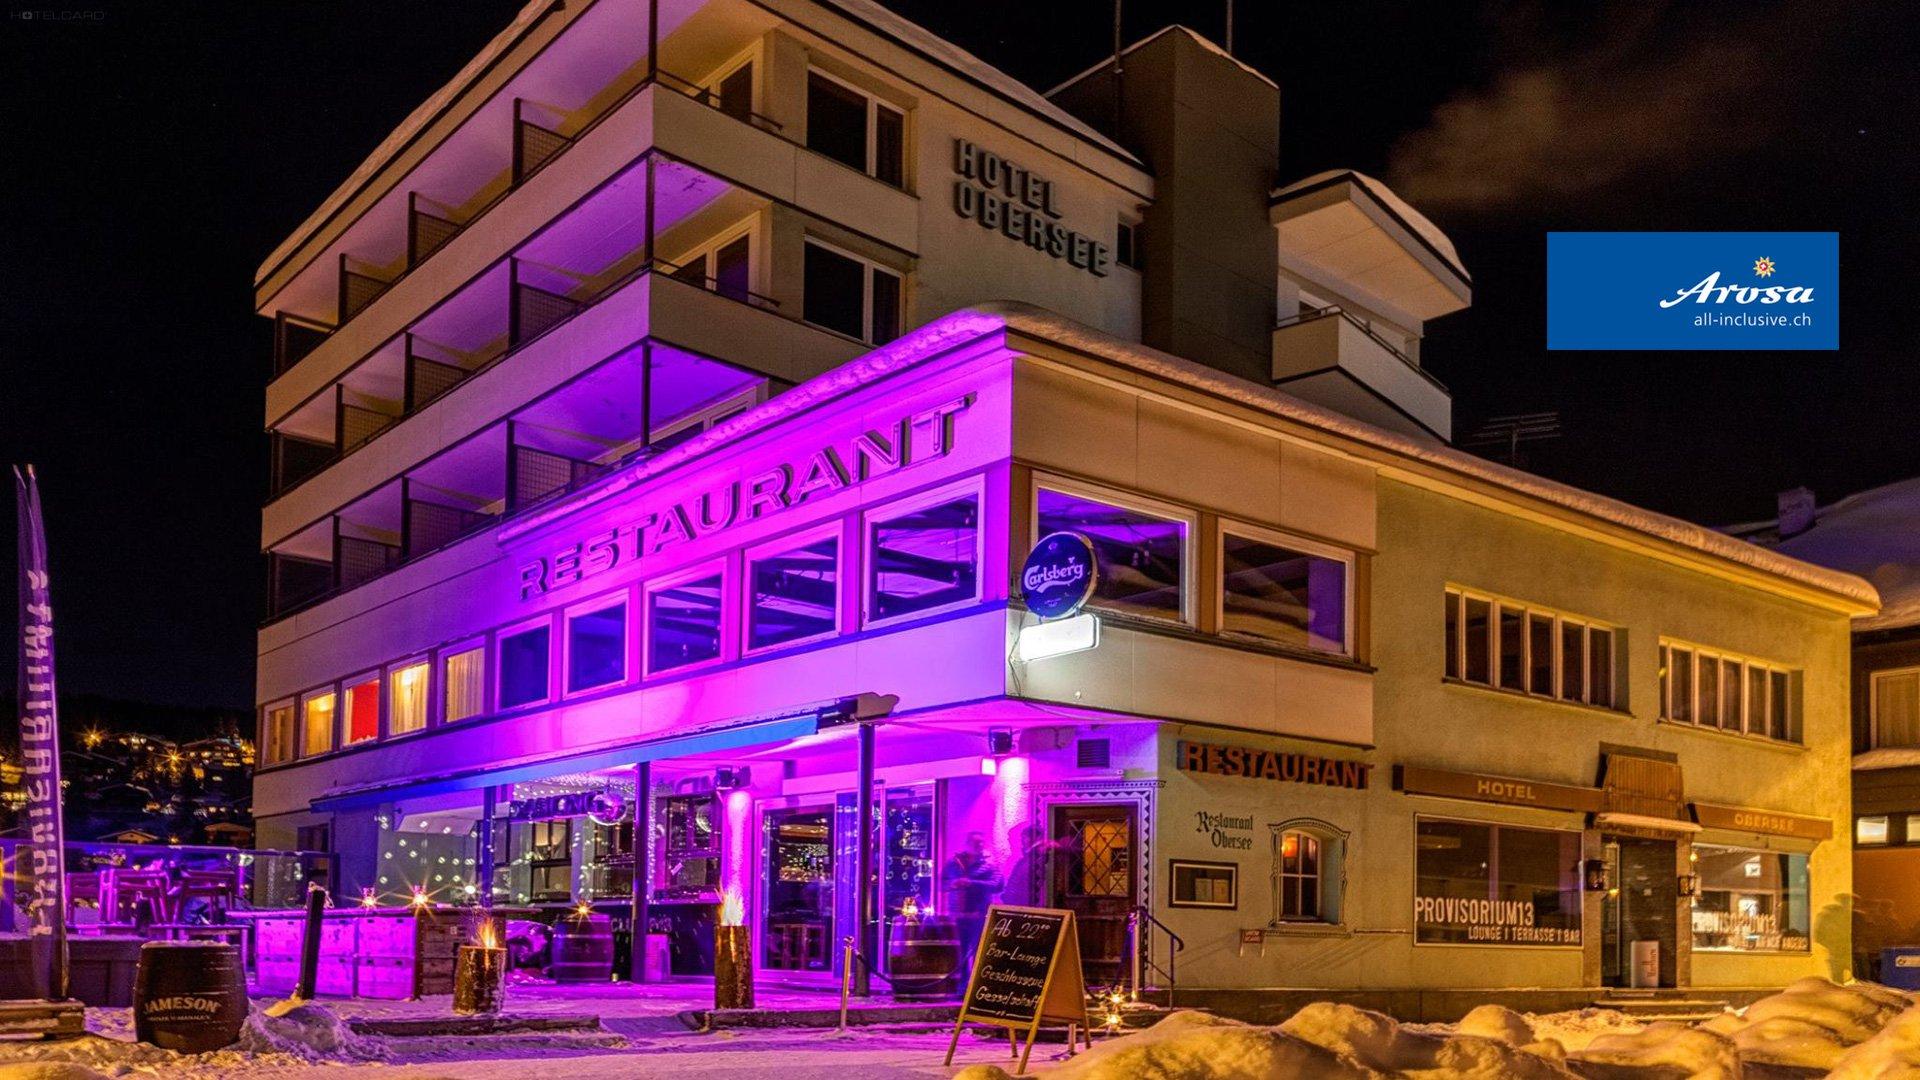 Hotel Provisorium 13 ehem. Hotel Obersee 0